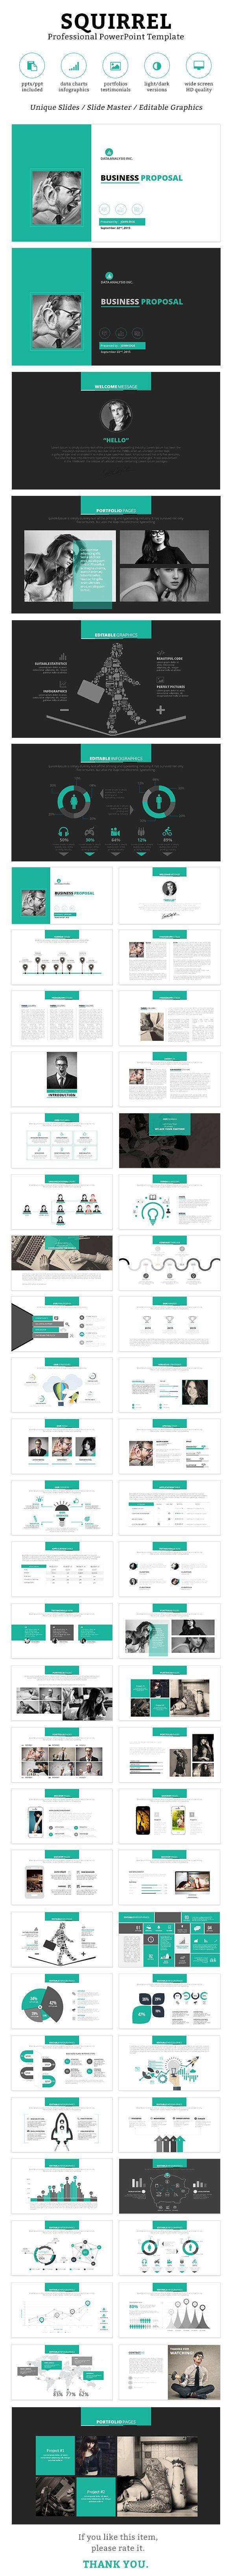 Squirrel PowerPoint Template #design #slides Download: http://graphicriver.net/item/squirrel-powerpoint-template/13058036?ref=ksioks